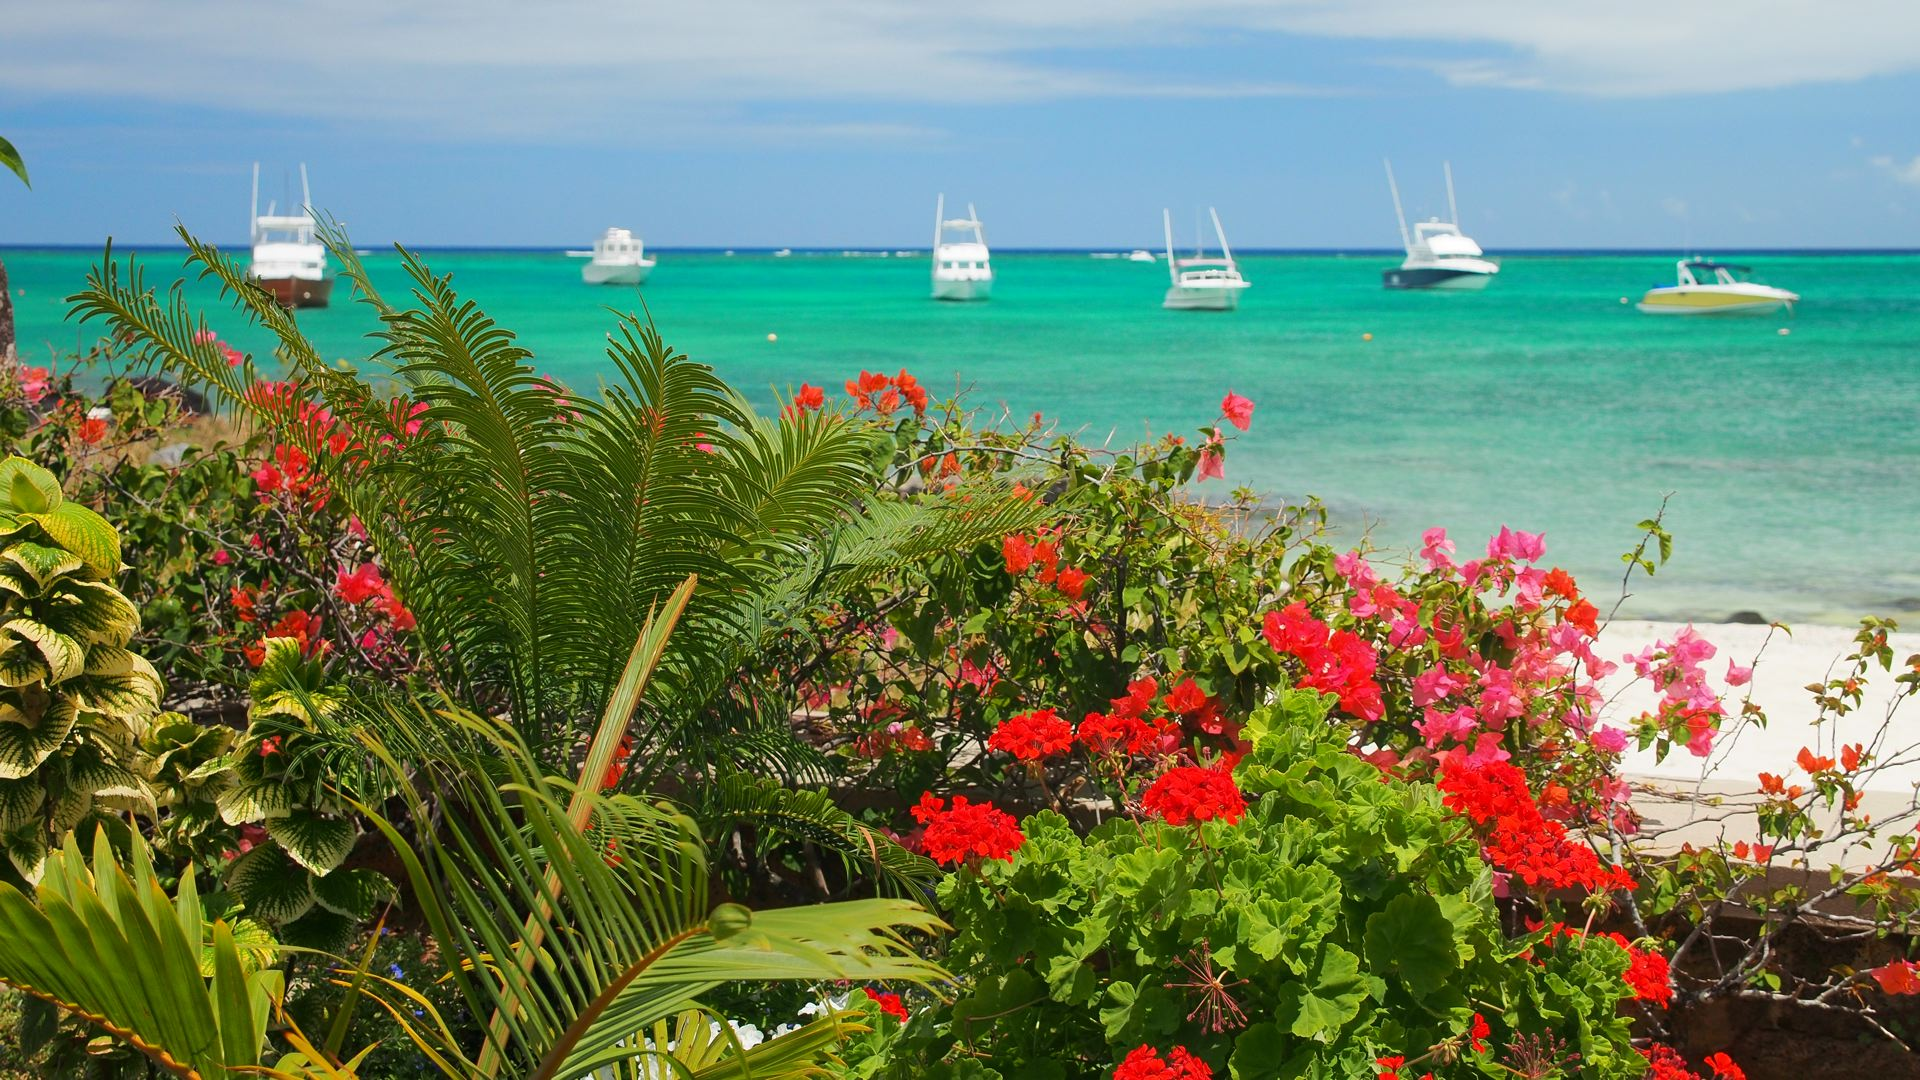 View from Lov. Le Cericier beach apartment .jpg